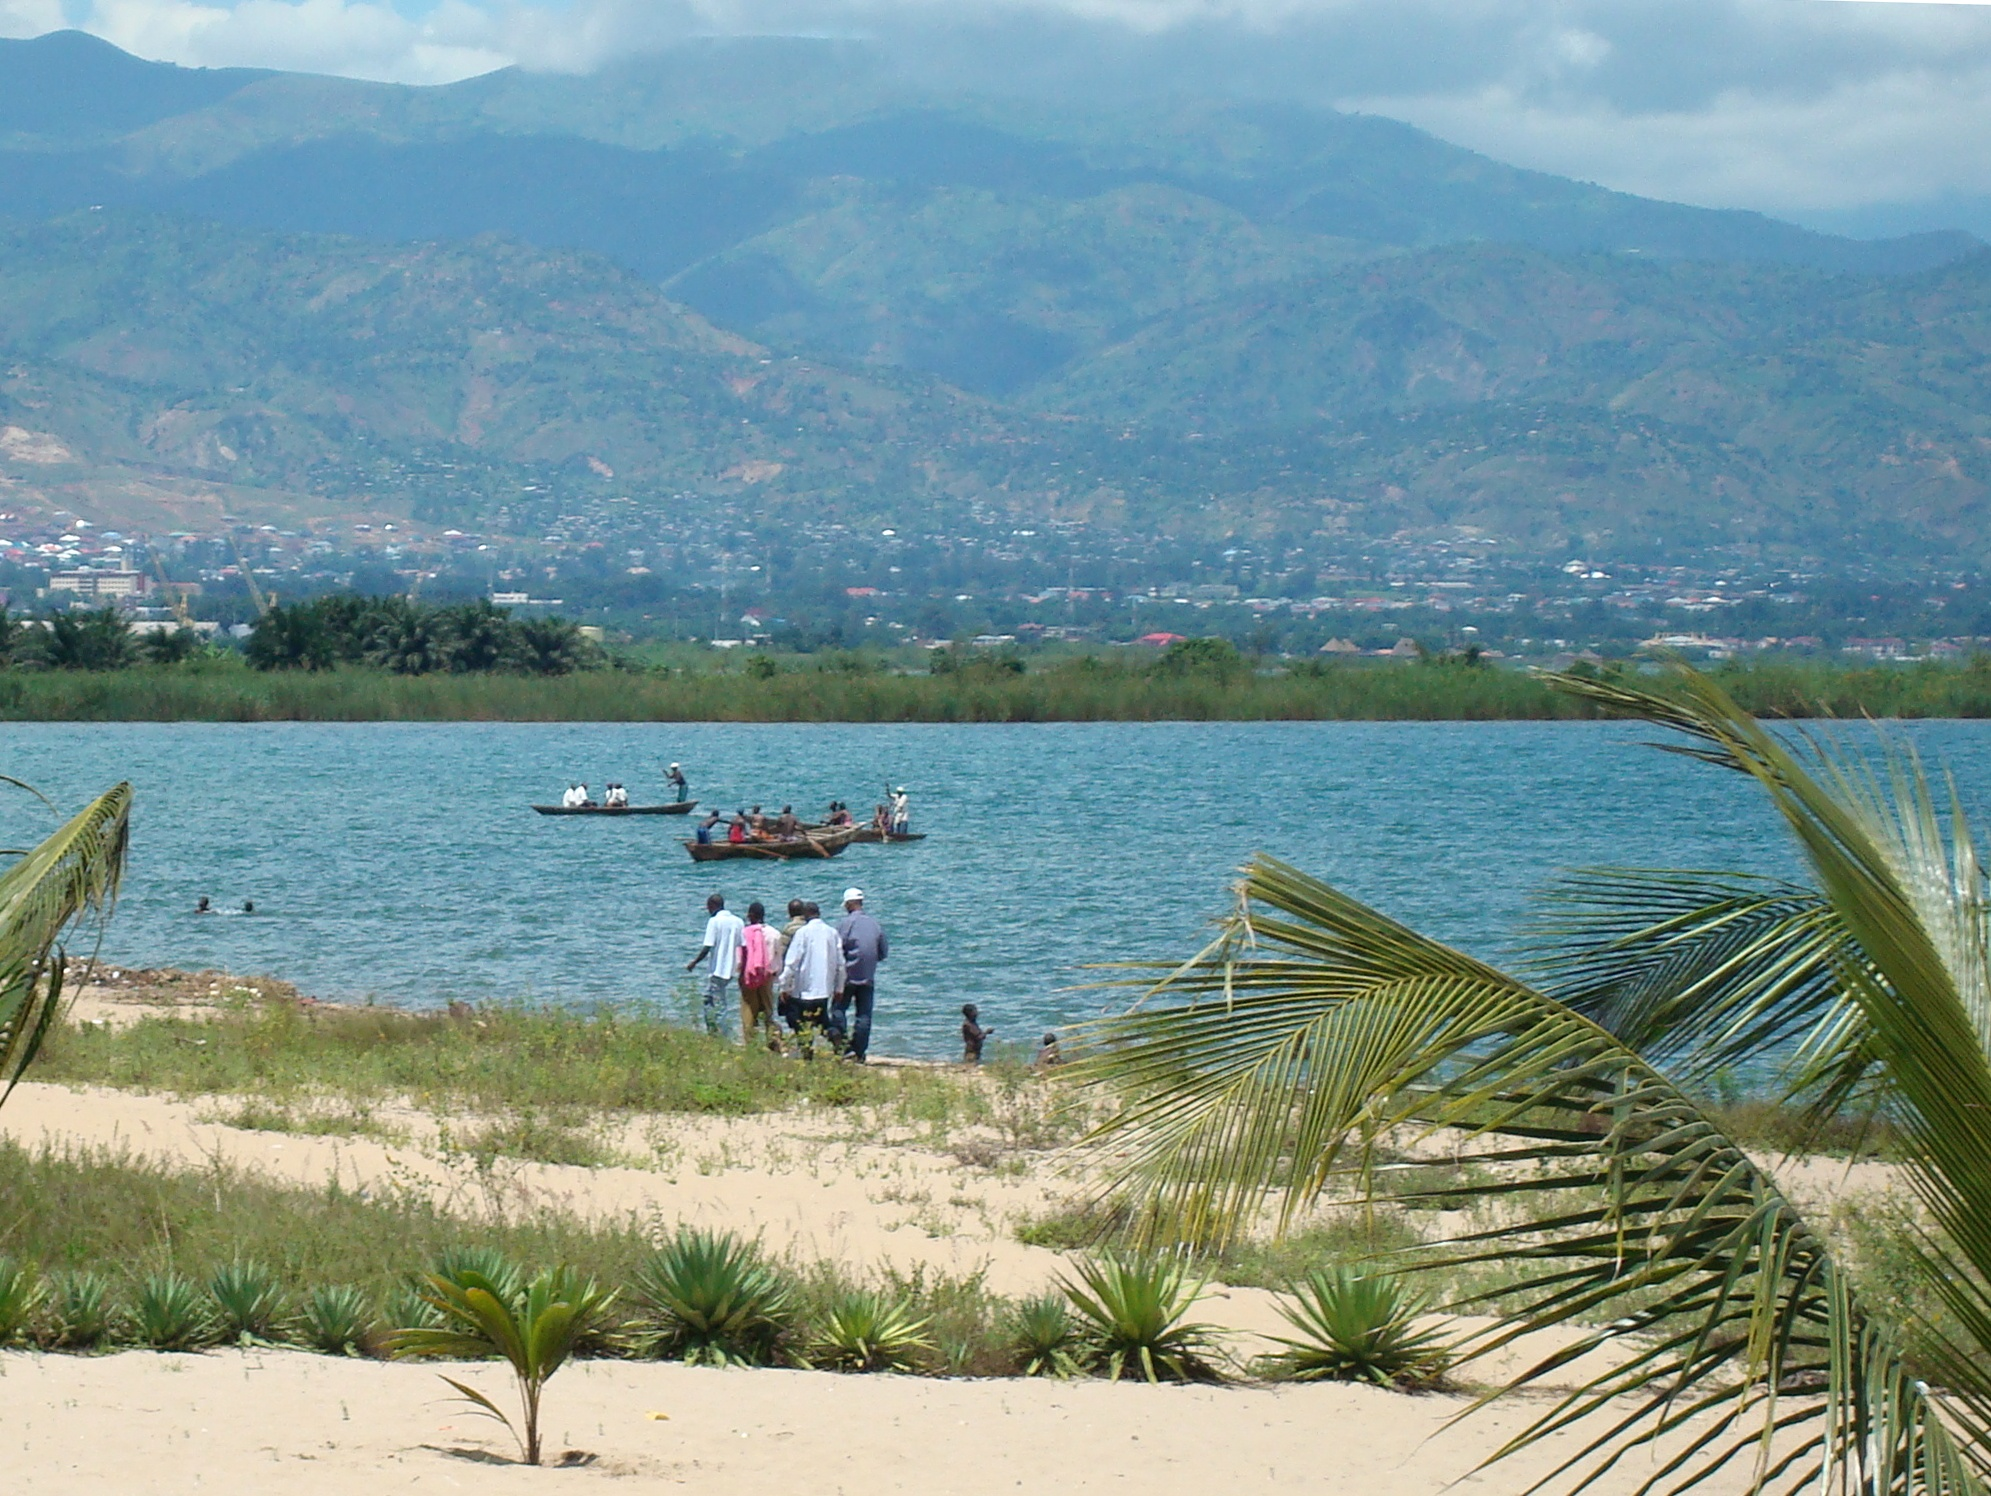 https://upload.wikimedia.org/wikipedia/commons/5/59/Bujumbura_%26_Lake_Tanganyika.JPG